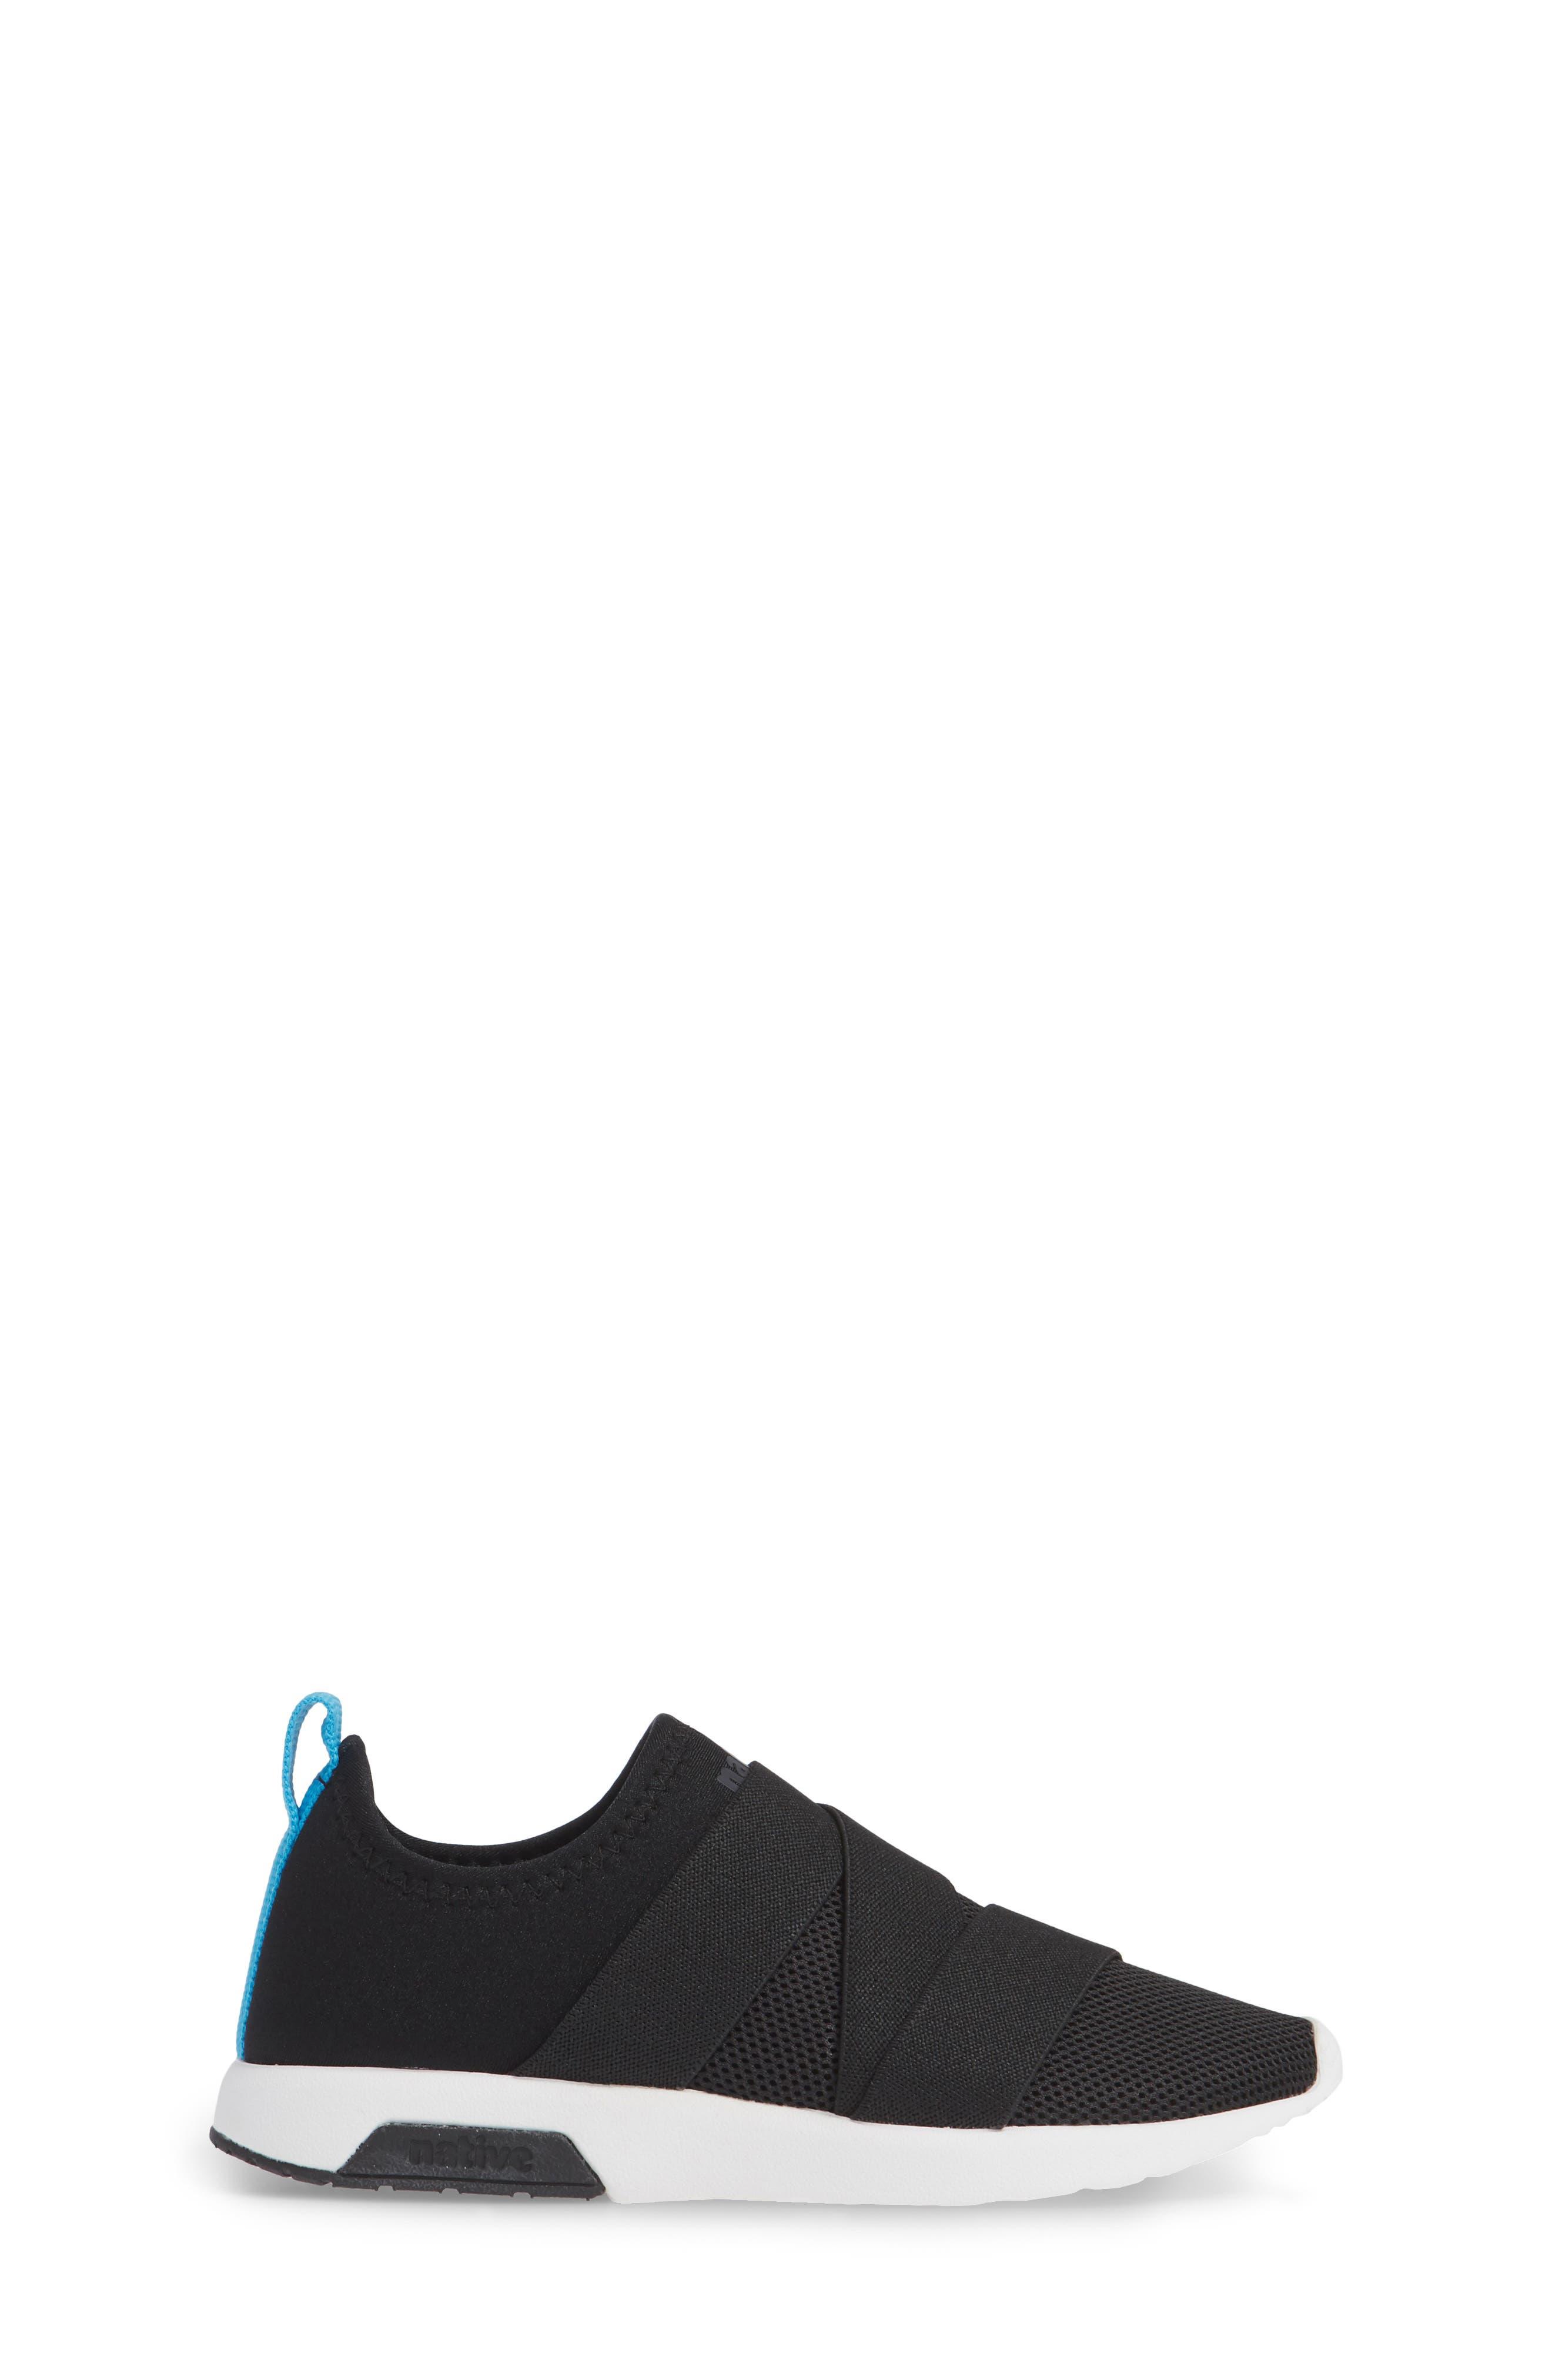 Phoenix Slip-On Sneaker,                             Alternate thumbnail 3, color,                             JIFFY BLACK/ SHELL WHITE